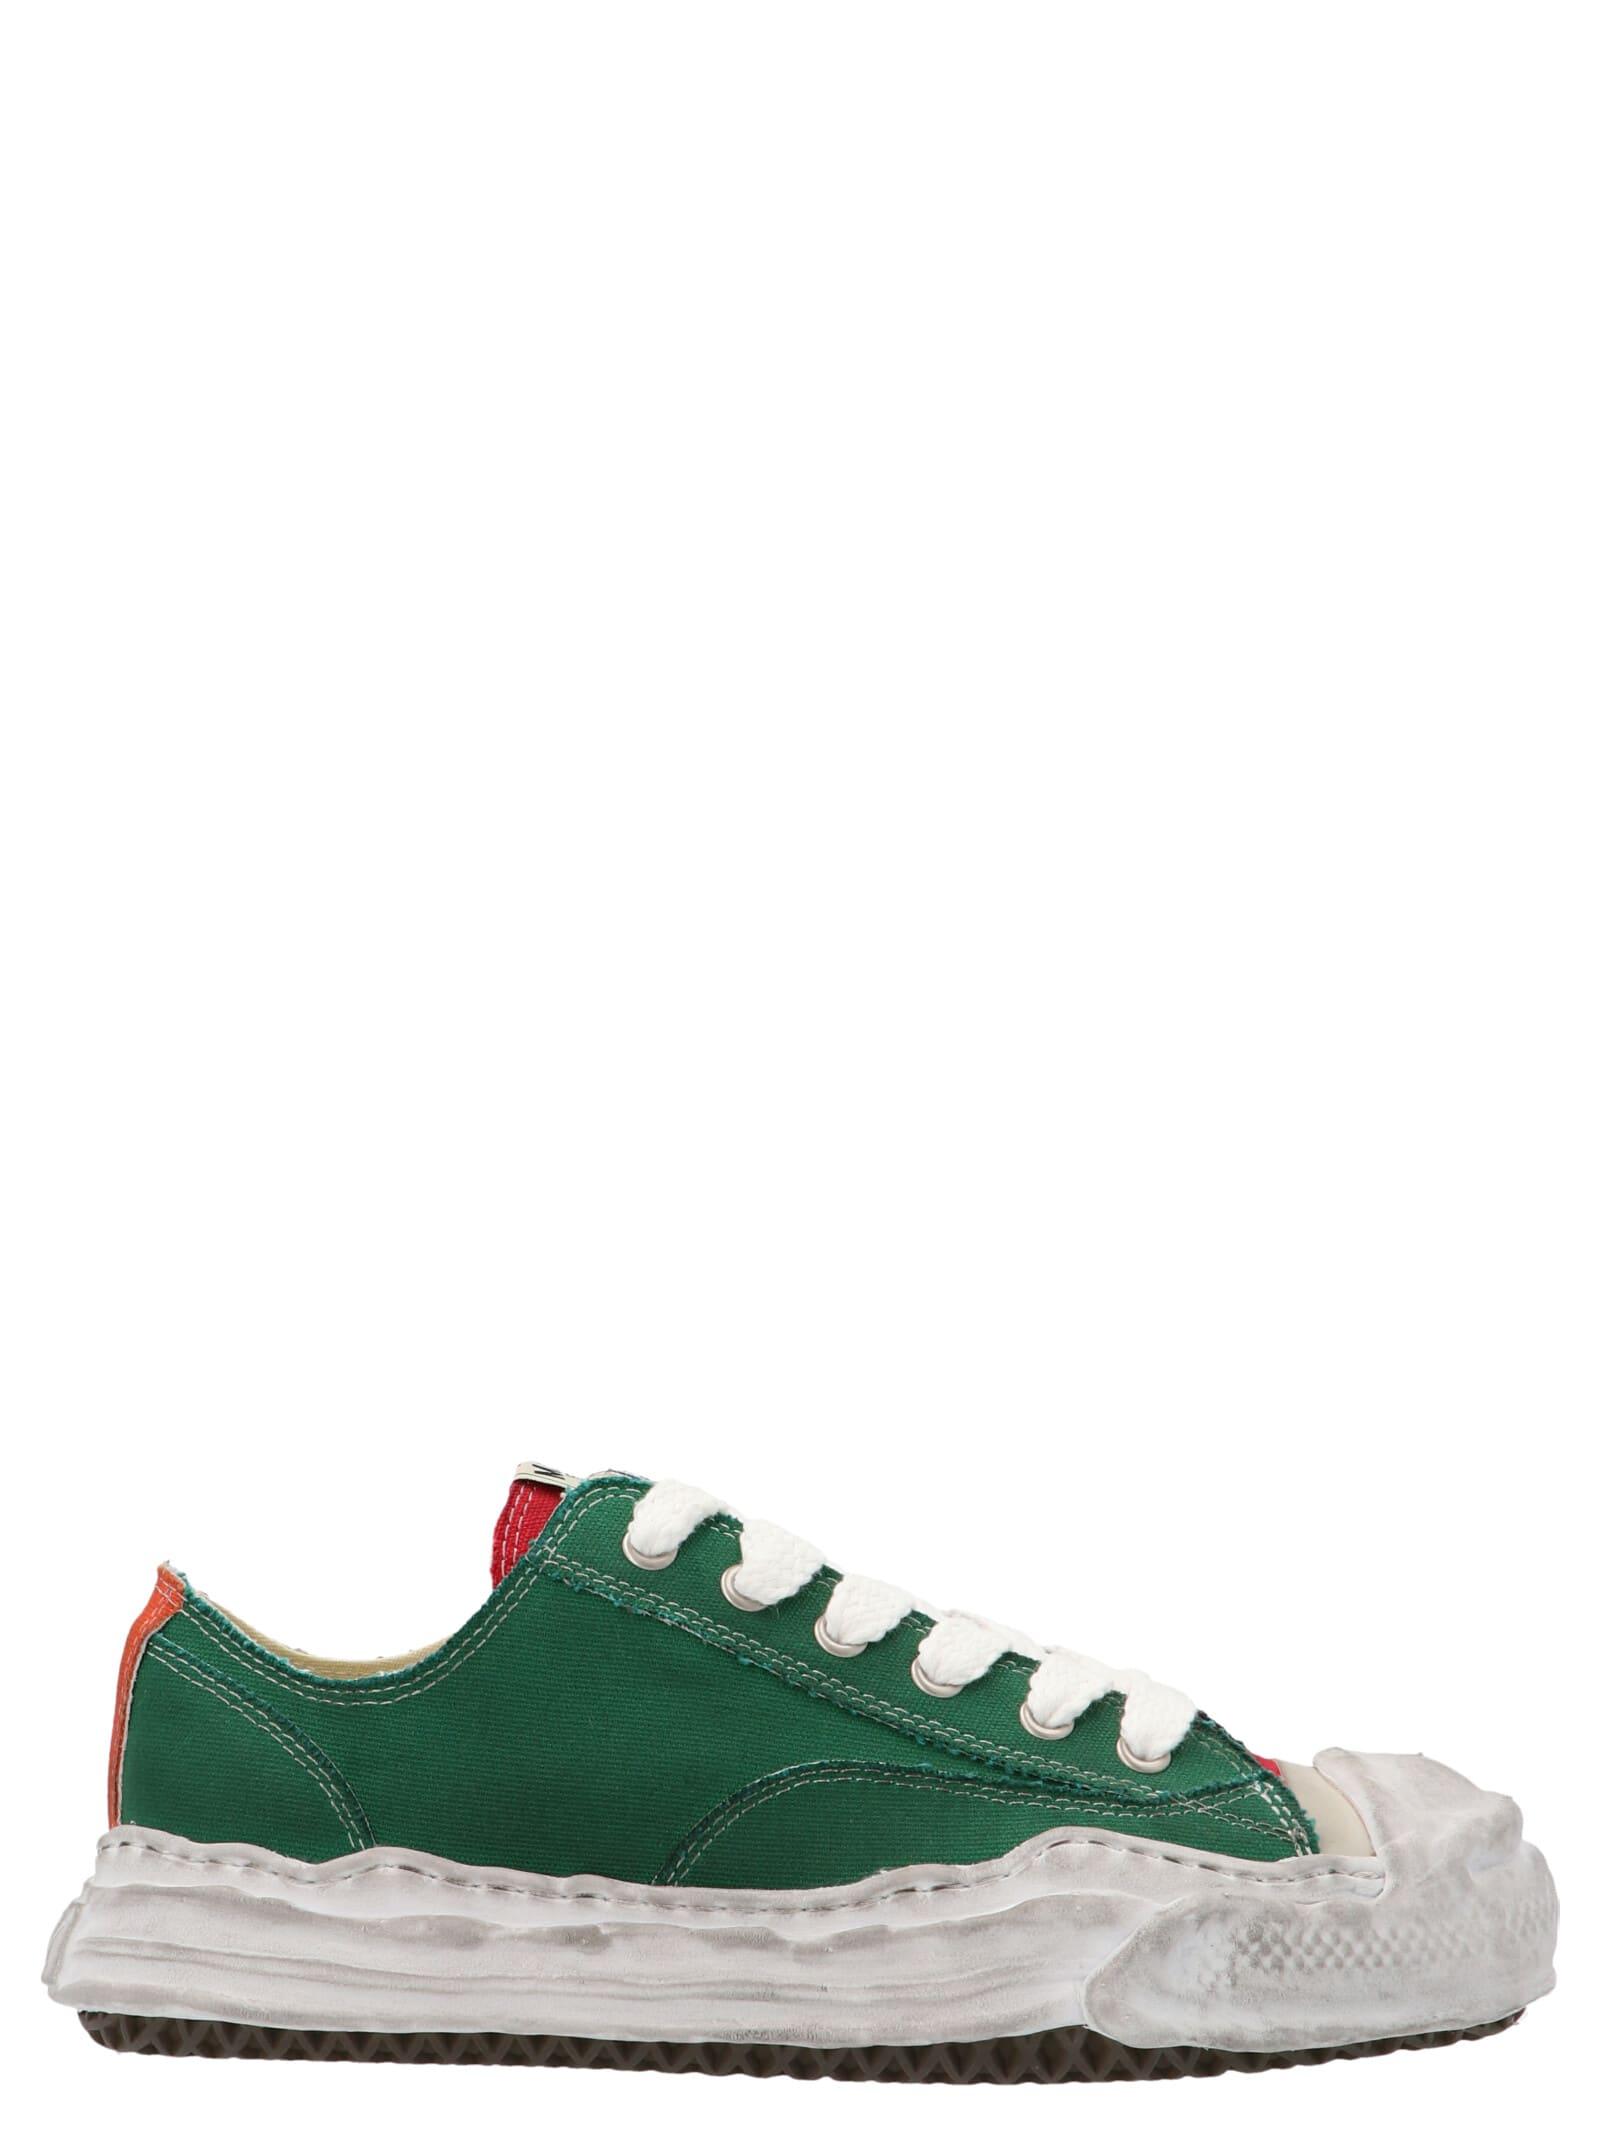 hank Low Shoes